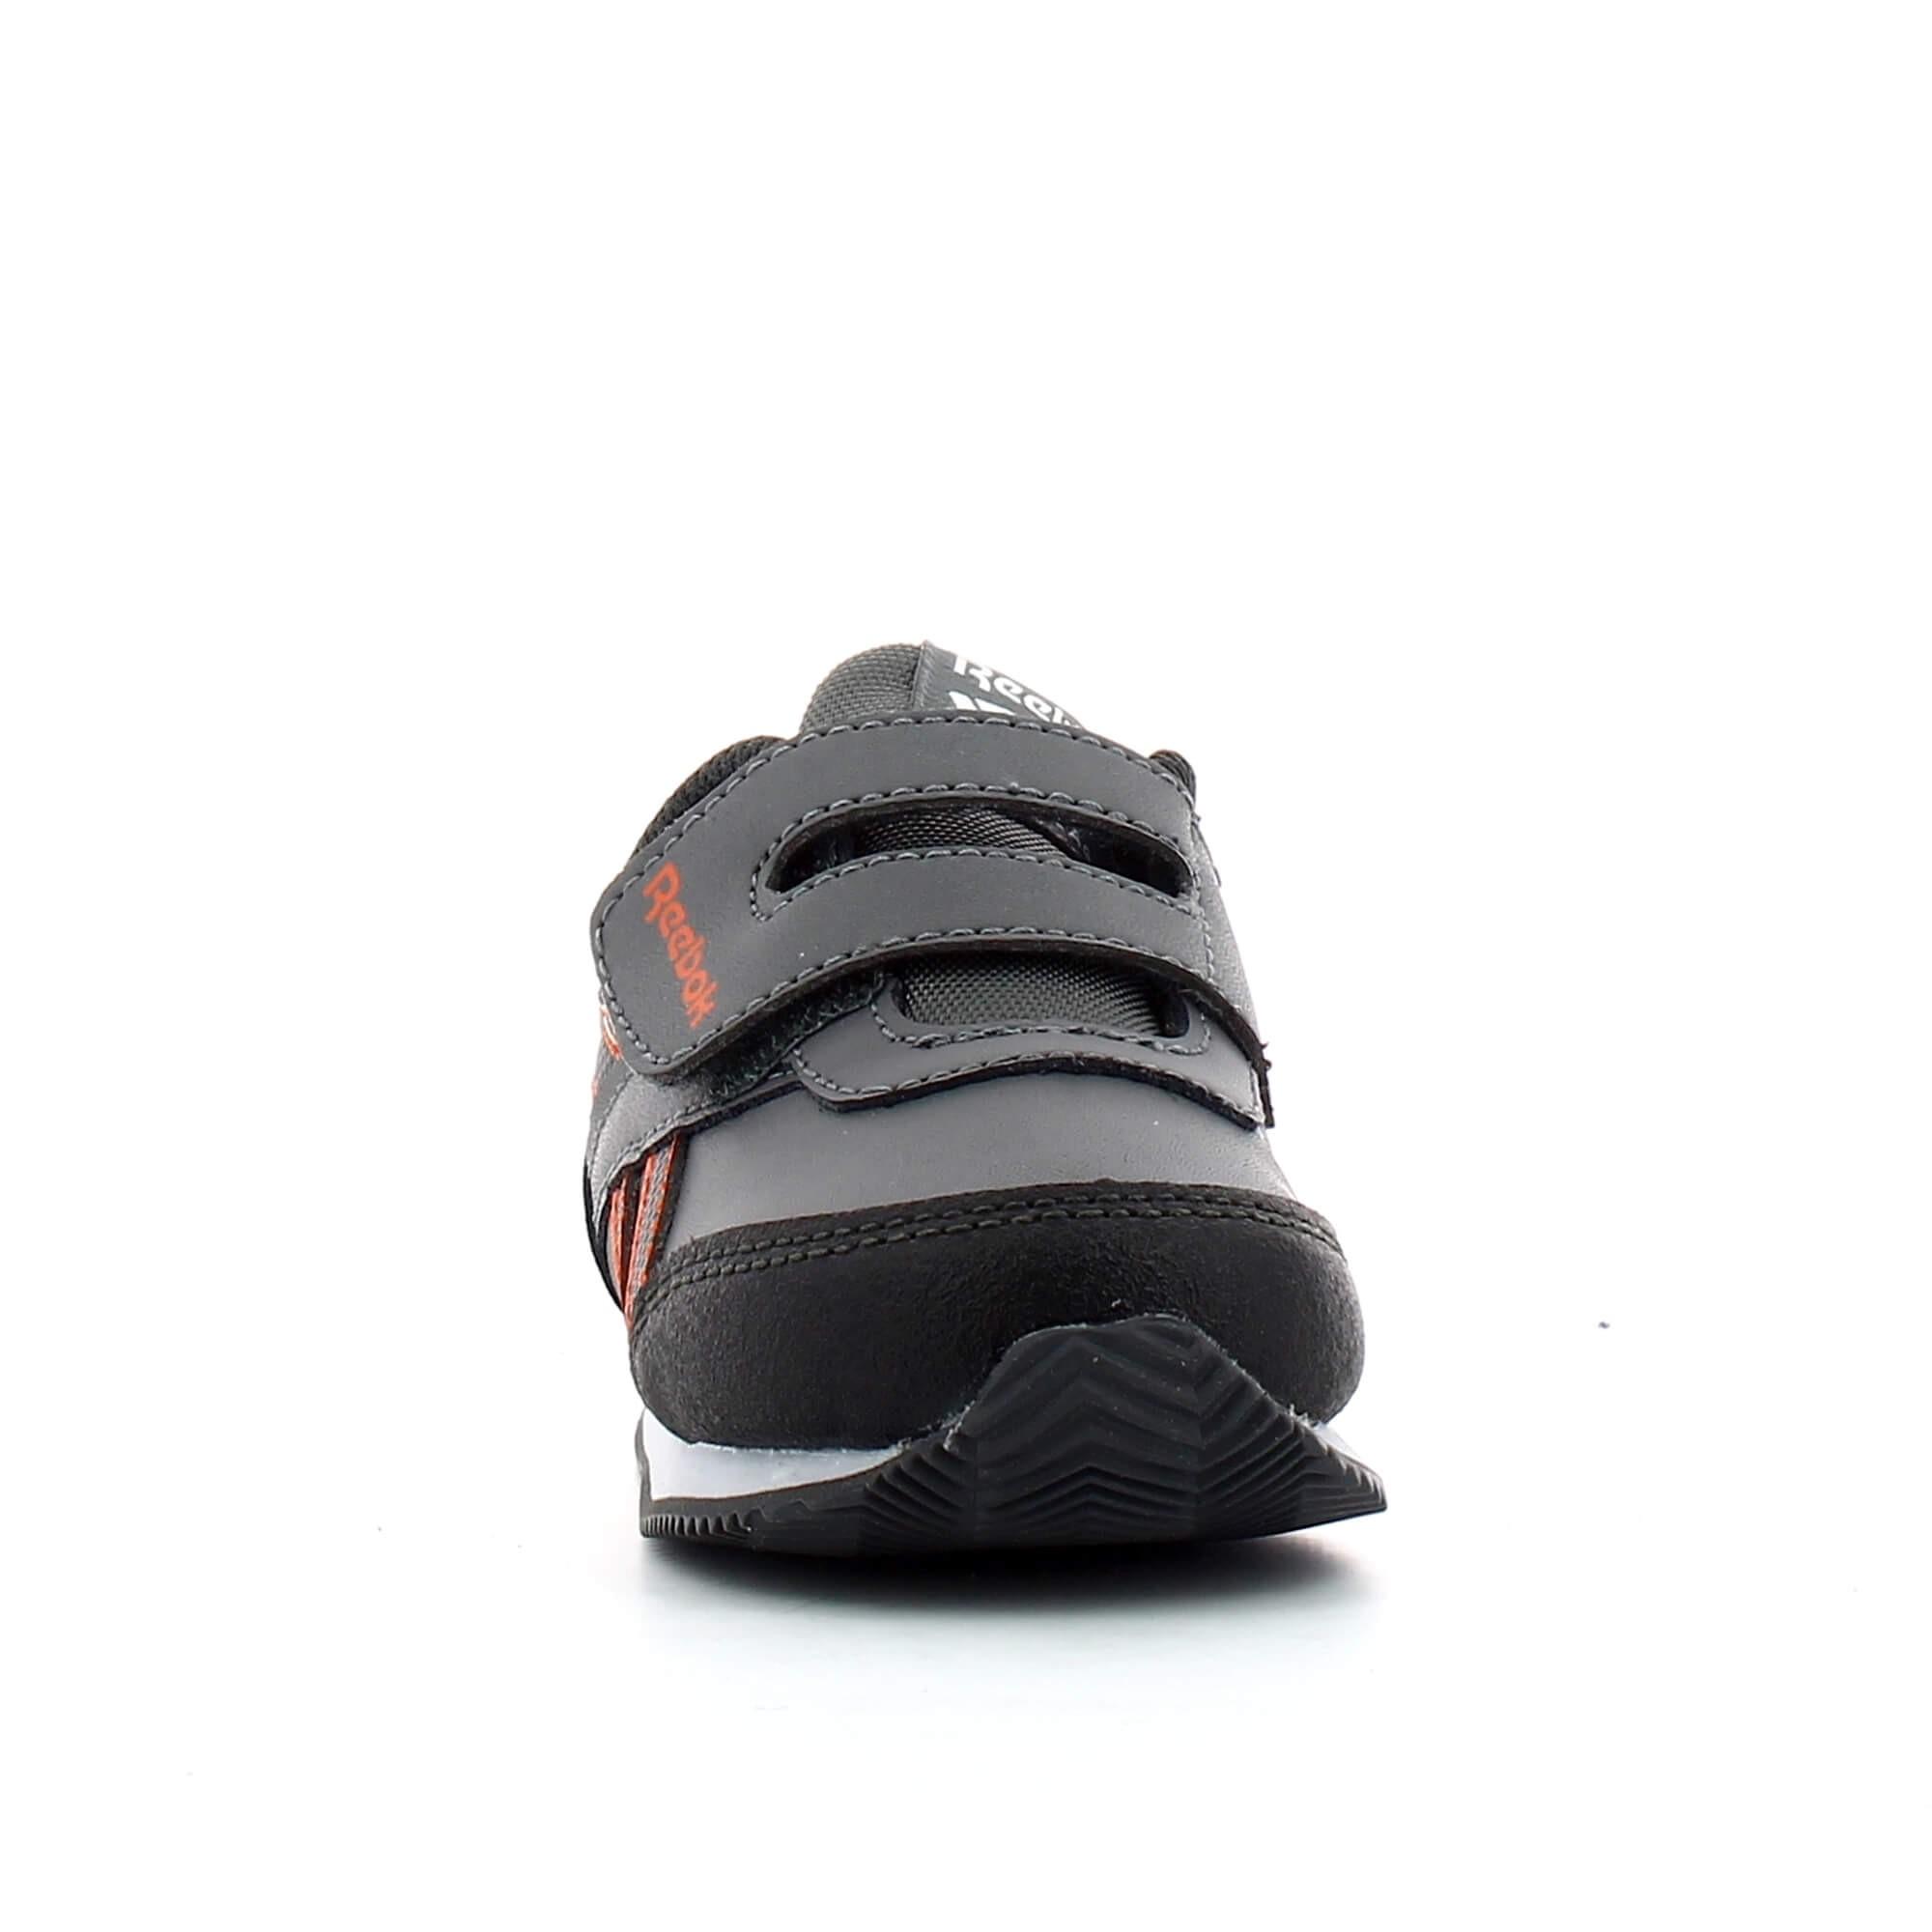 ae9e278bd75 Zapatillas Reebok Royal Cljog 2 Rs Kc Gris Bebe - Deportes Moya